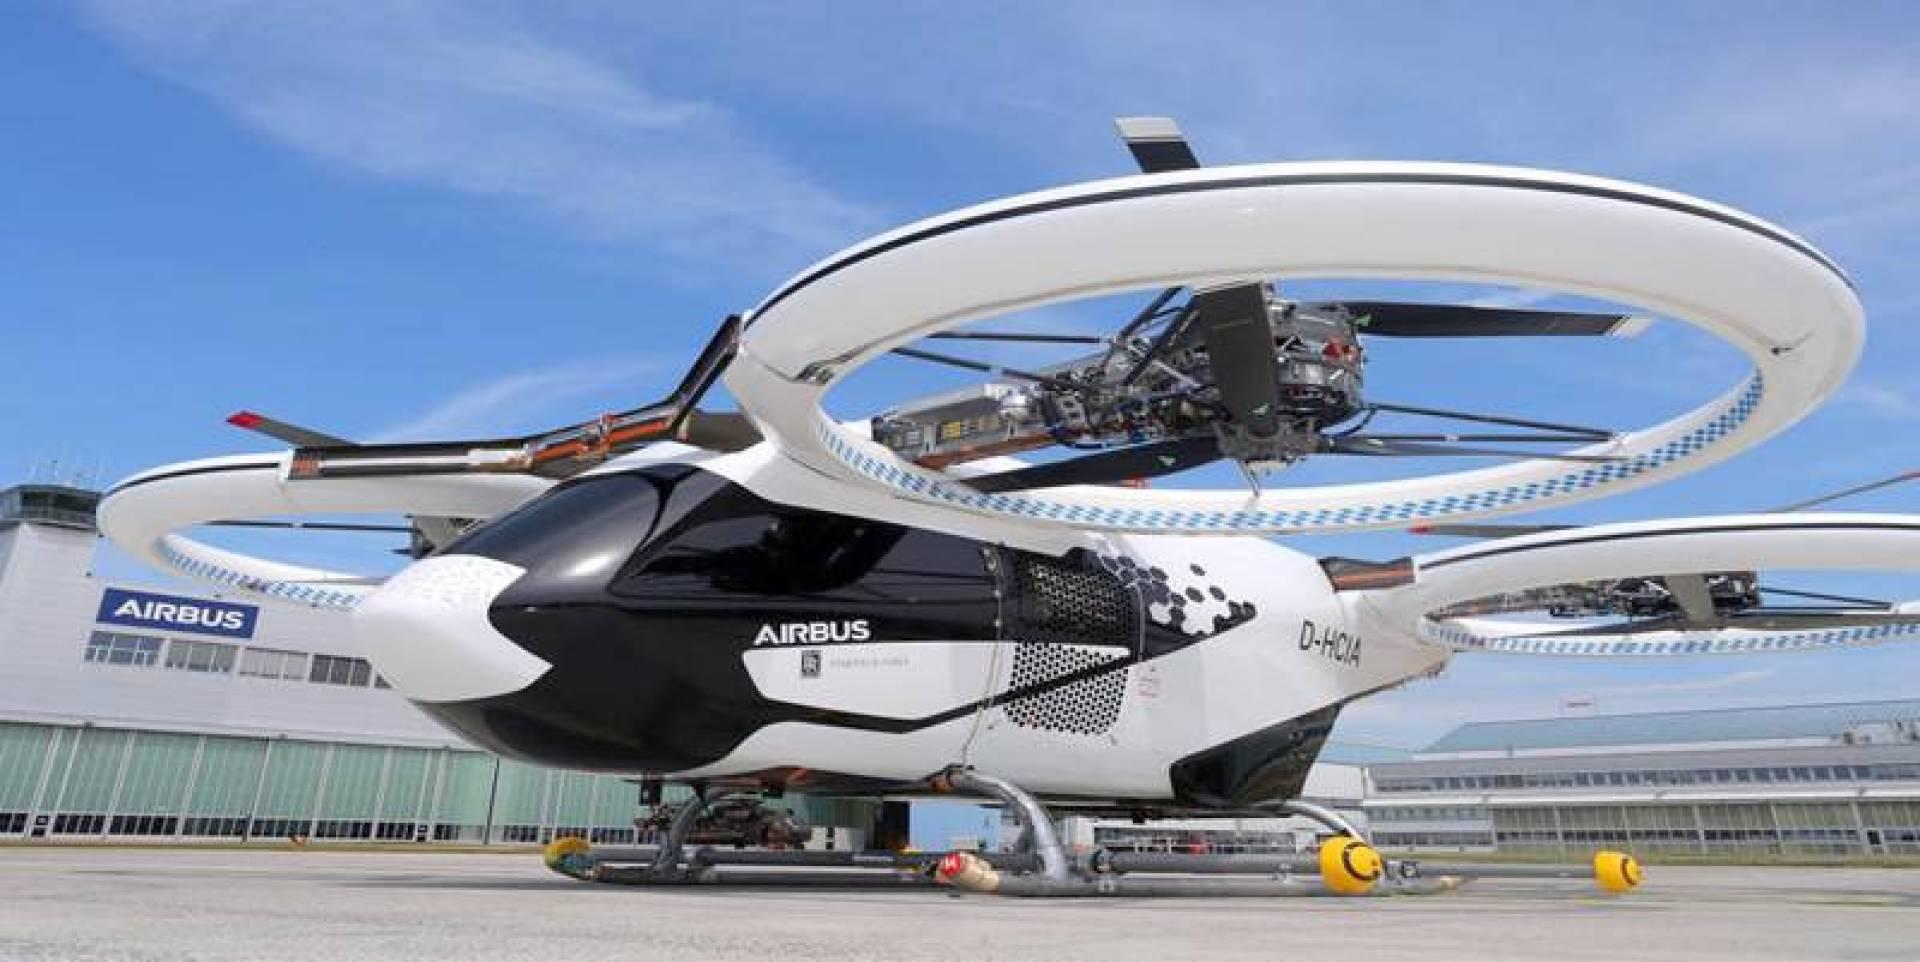 «CityAirbus».. تاكسي طائر ينطلق في سماء ألمانيا